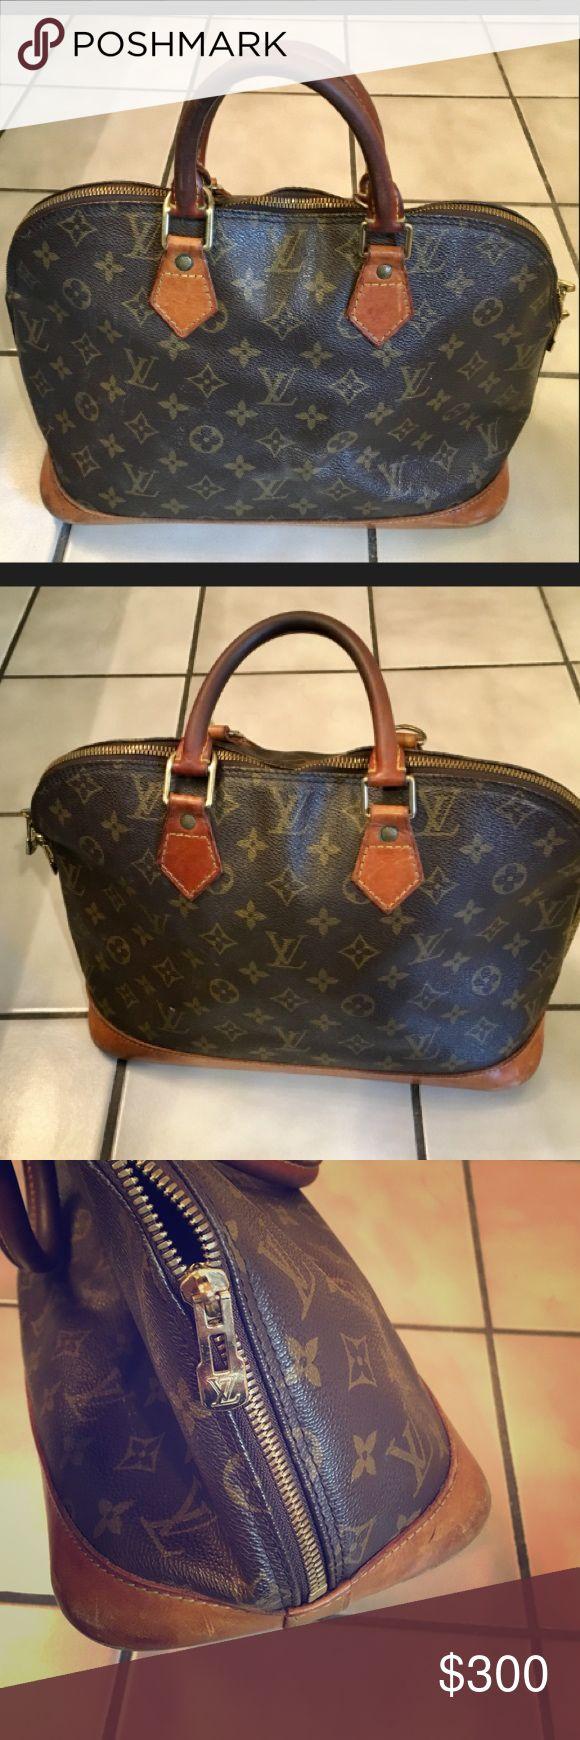 Authentic Vintage Louis Vuitton Bag 💼 💯% authentic vintage Louis Vuitton bag in loved condition and ready for a new home for a super bargain! 💼 Happy Poshing! 😊💕🛍 Louis Vuitton Bags Totes